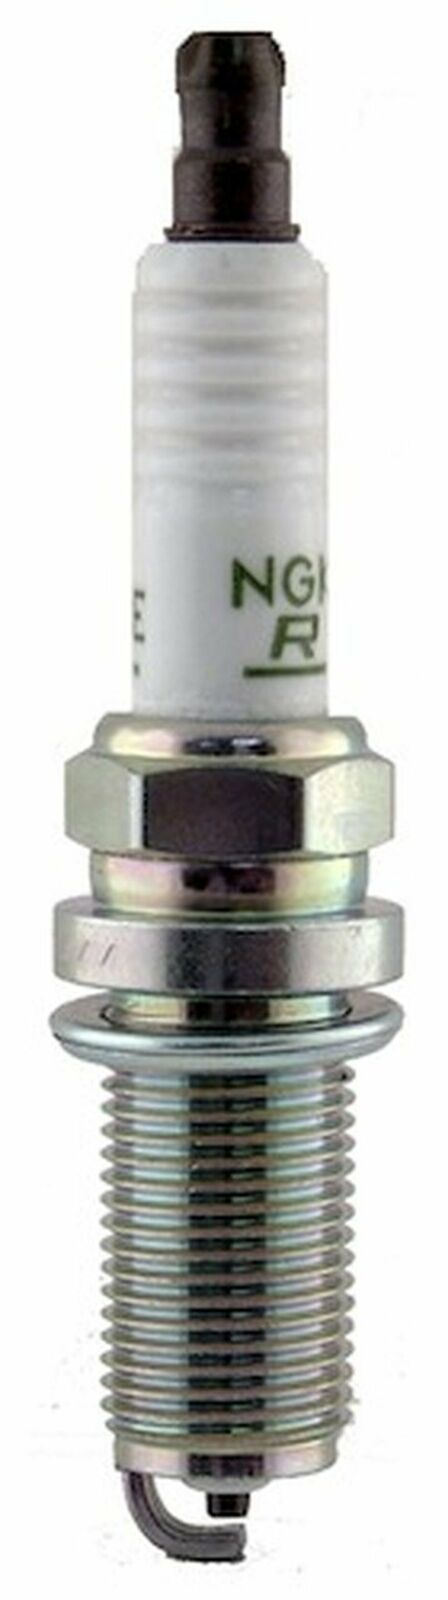 10 pcs NGK 6499 Standard Spark Plug for LFR4A-E 6499 Engine Kit Set Tune cb